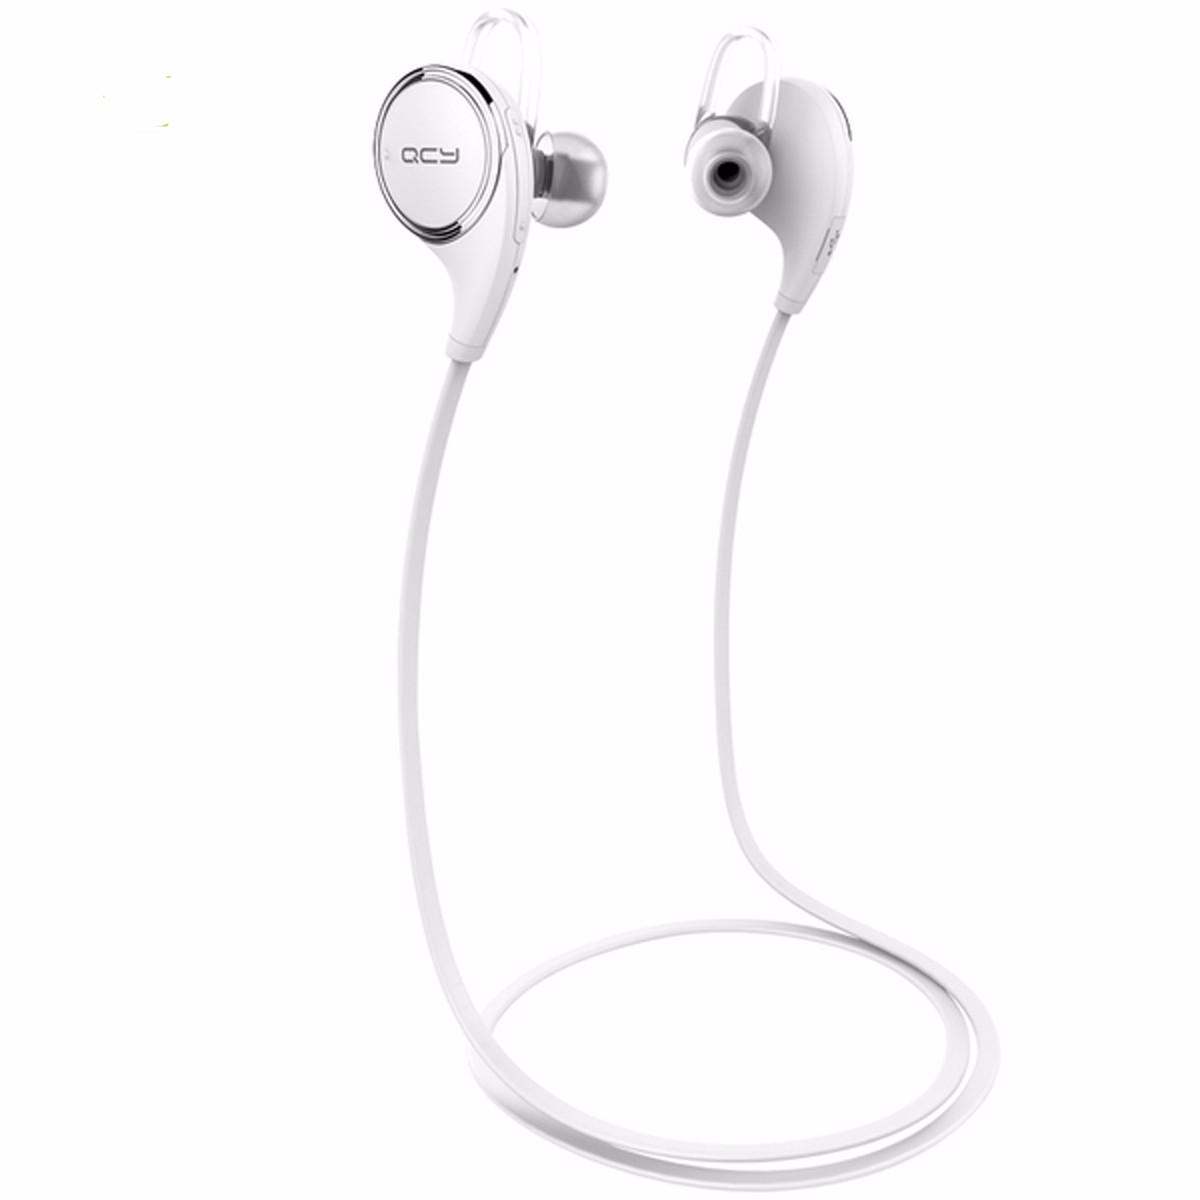 ELEGIANT Sweatproof bluetooth Wireless Headphones with Mic Noise Reduce Stereo In-Ear Earbuds Sport Headphones for Apple Mobile Phones Notebook Computers